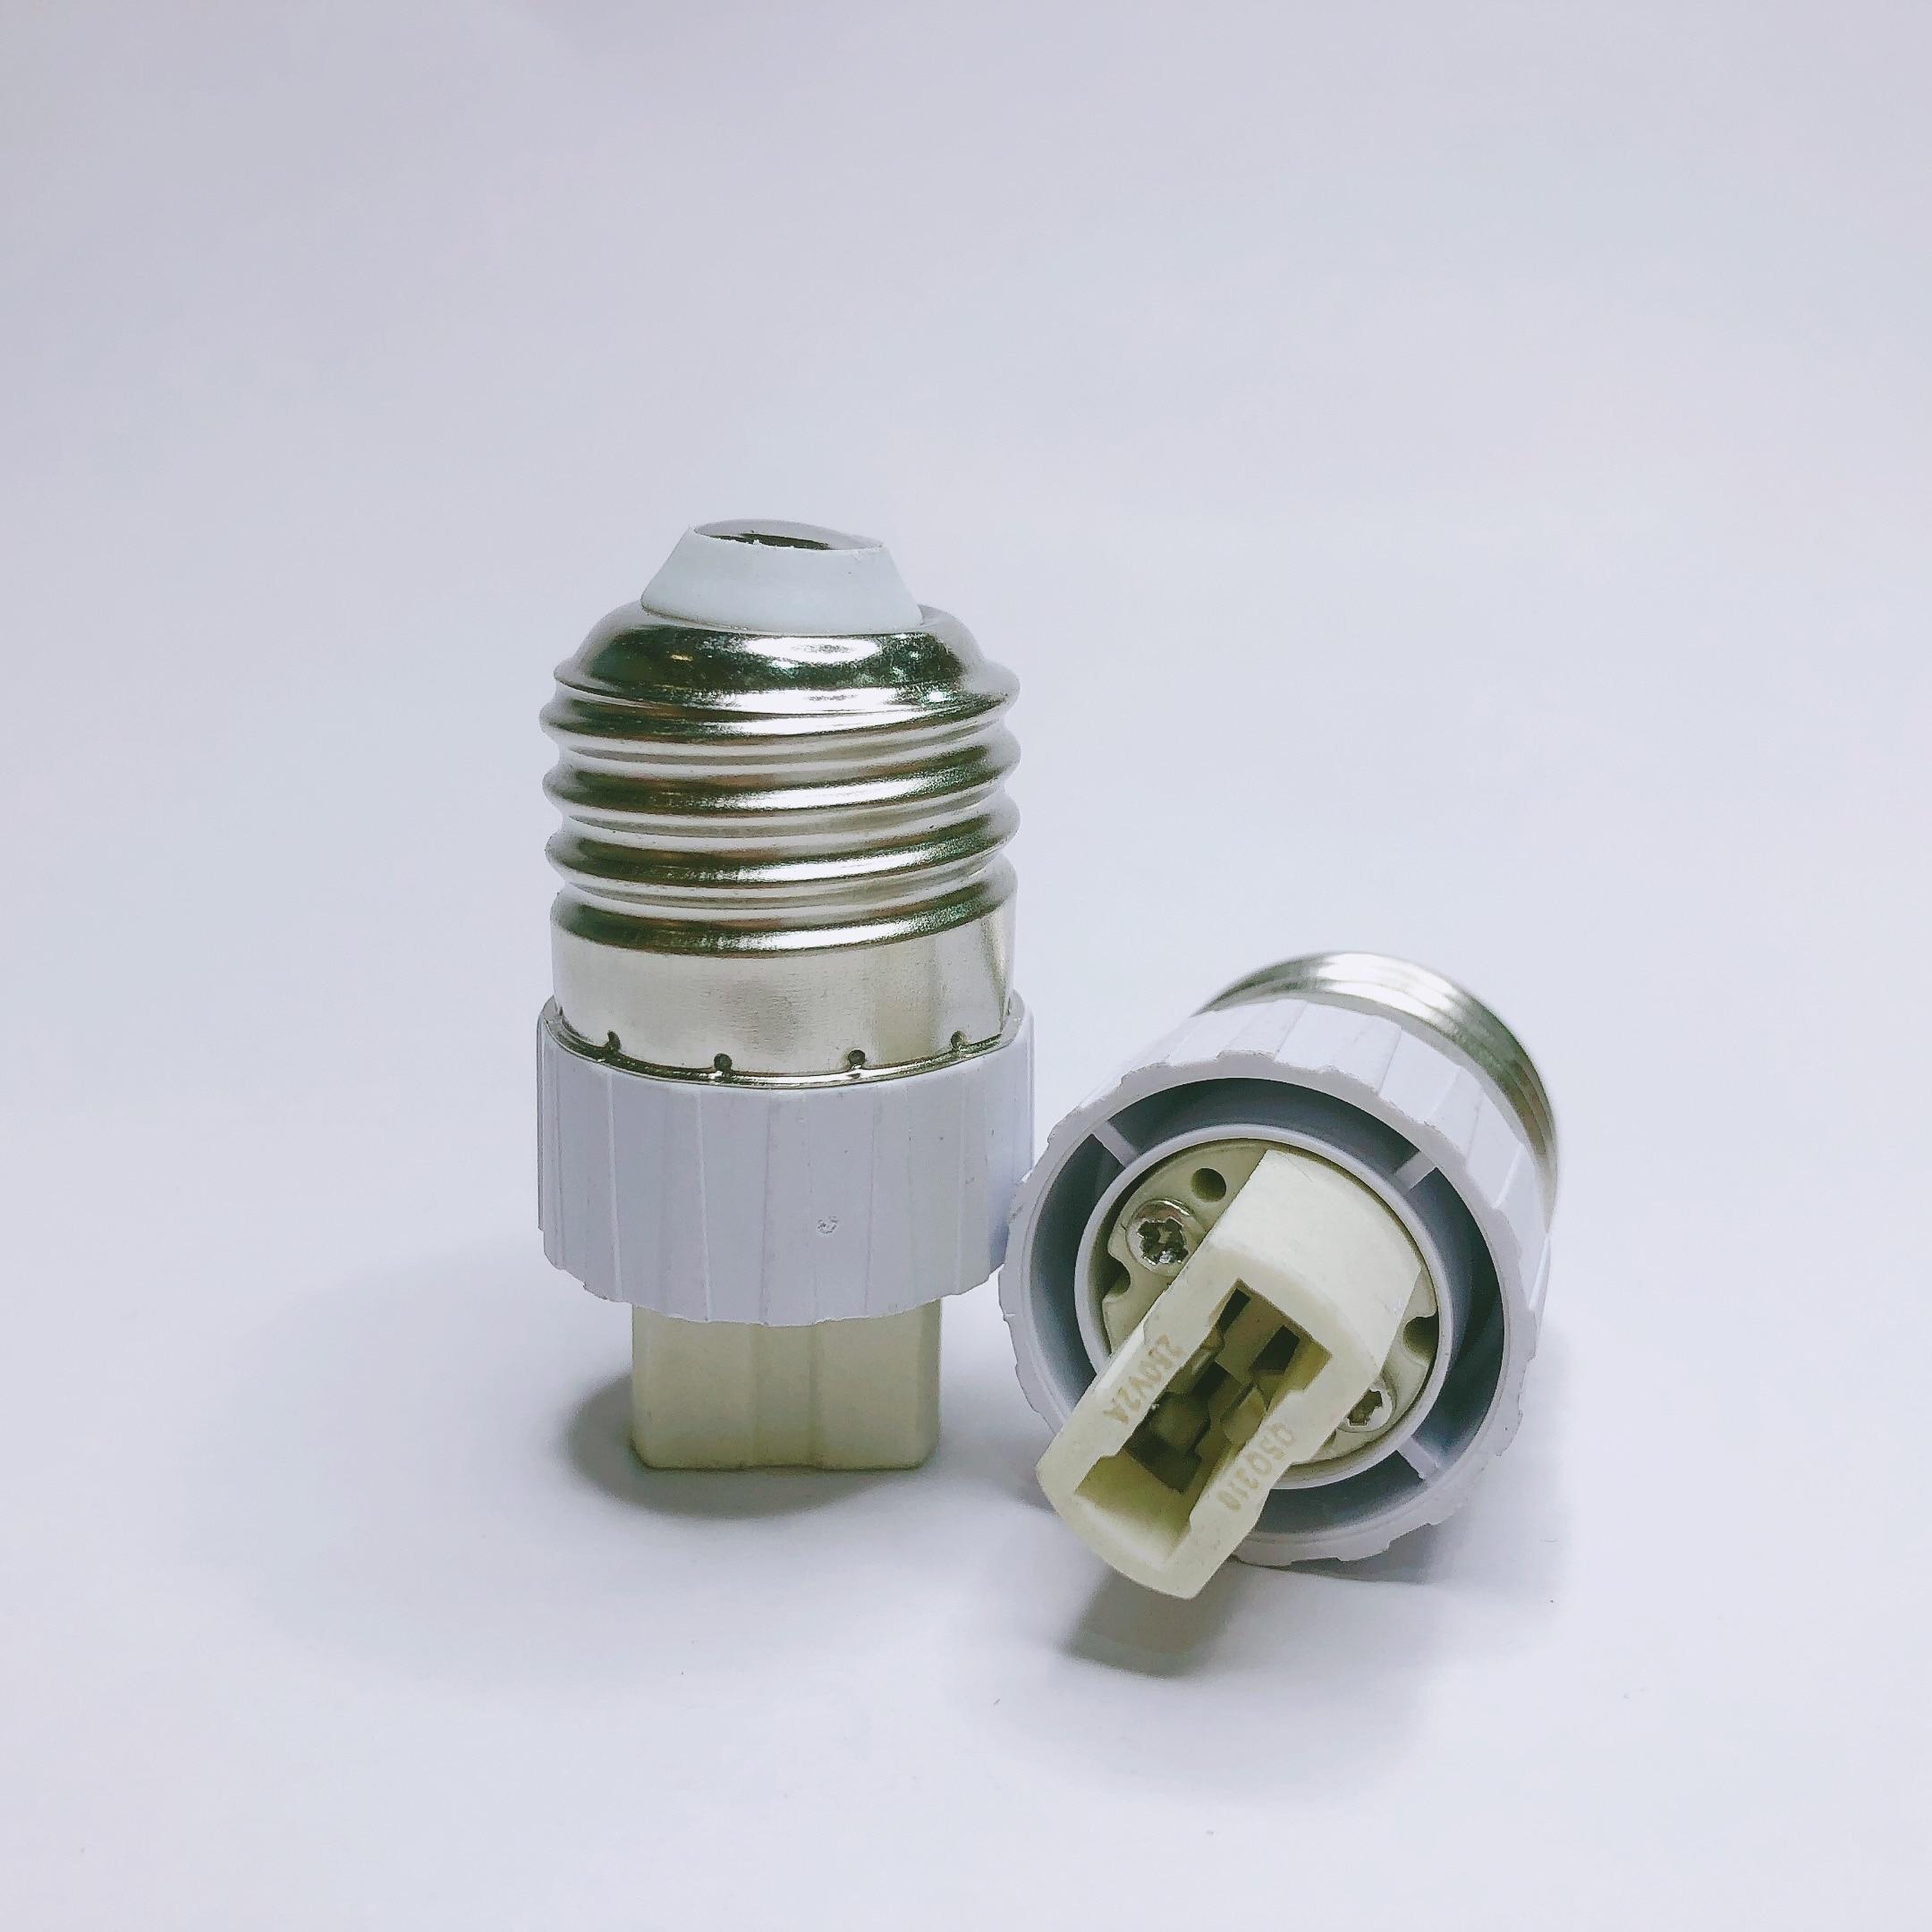 1x Fireproof Material E27 to G9 lamp Holder Converter Socket Conversion light Bulb Base type Adapter(China)